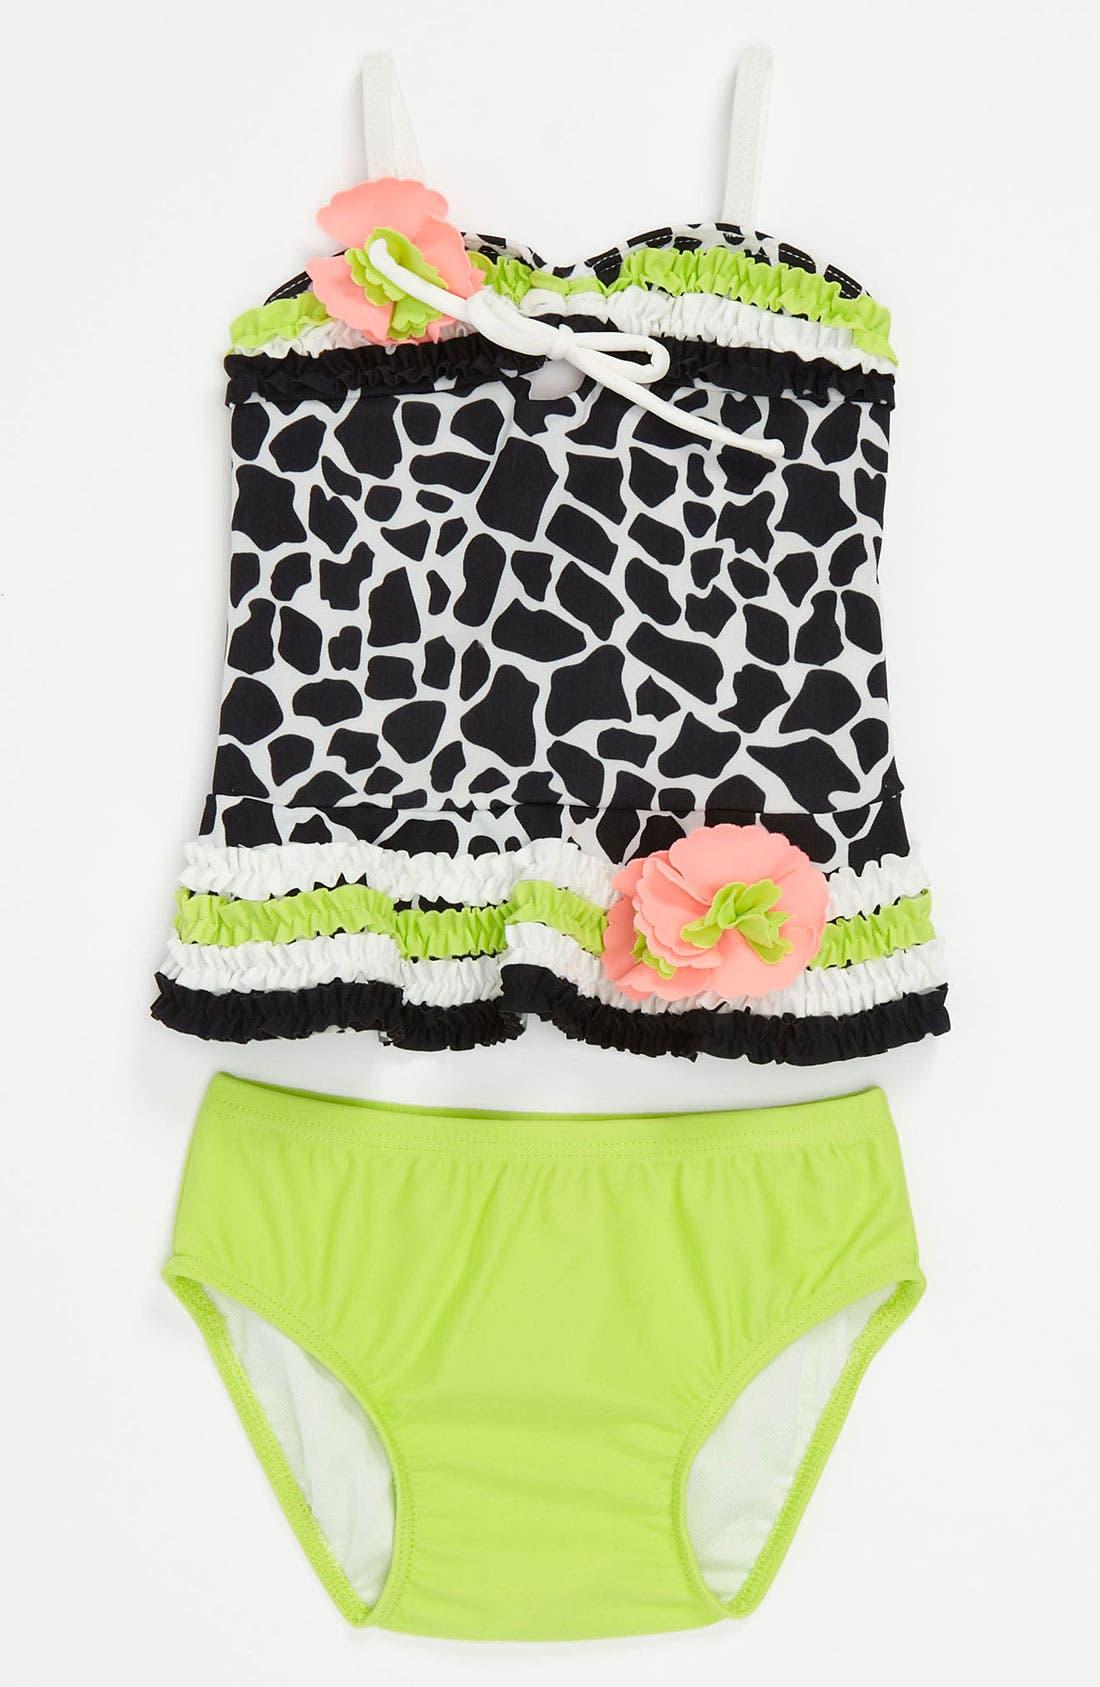 Main Image - Isobella & Chloe 'Safari Print' Two Piece Swimsuit (Infant)